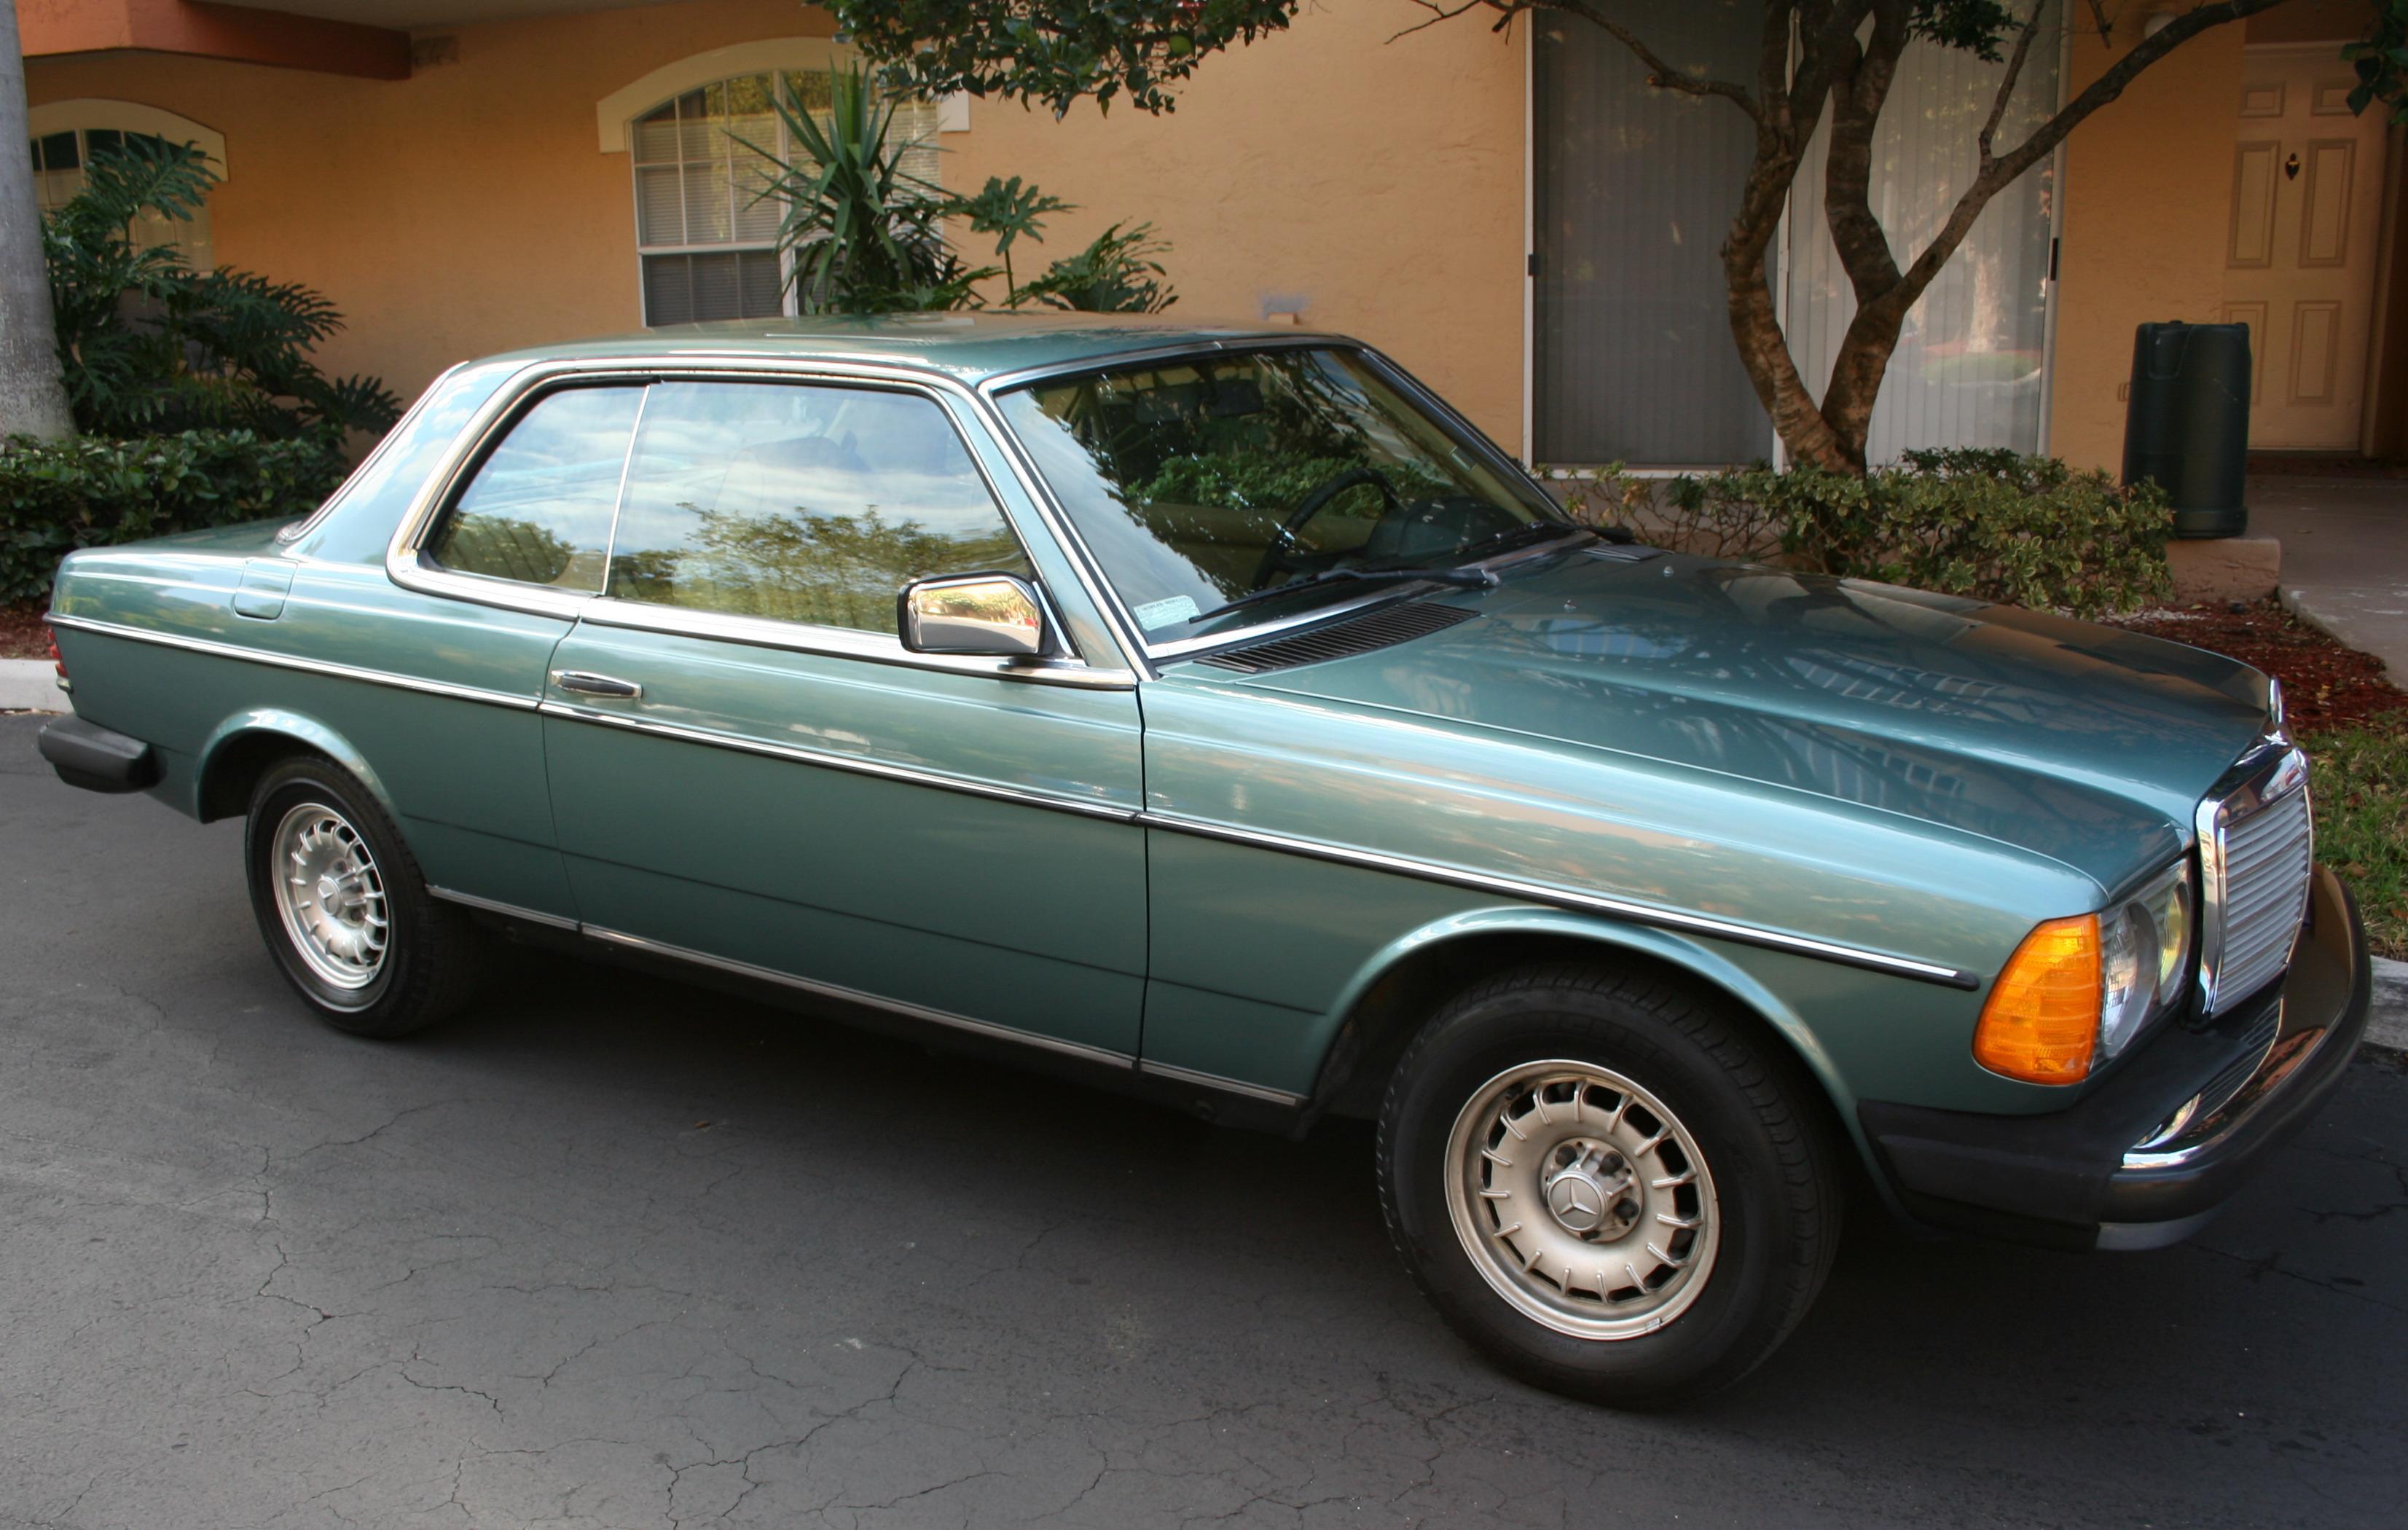 http://carsot.com/images/mercedesbenz-w123-1975-1985-coupe-exterior-4.jpg